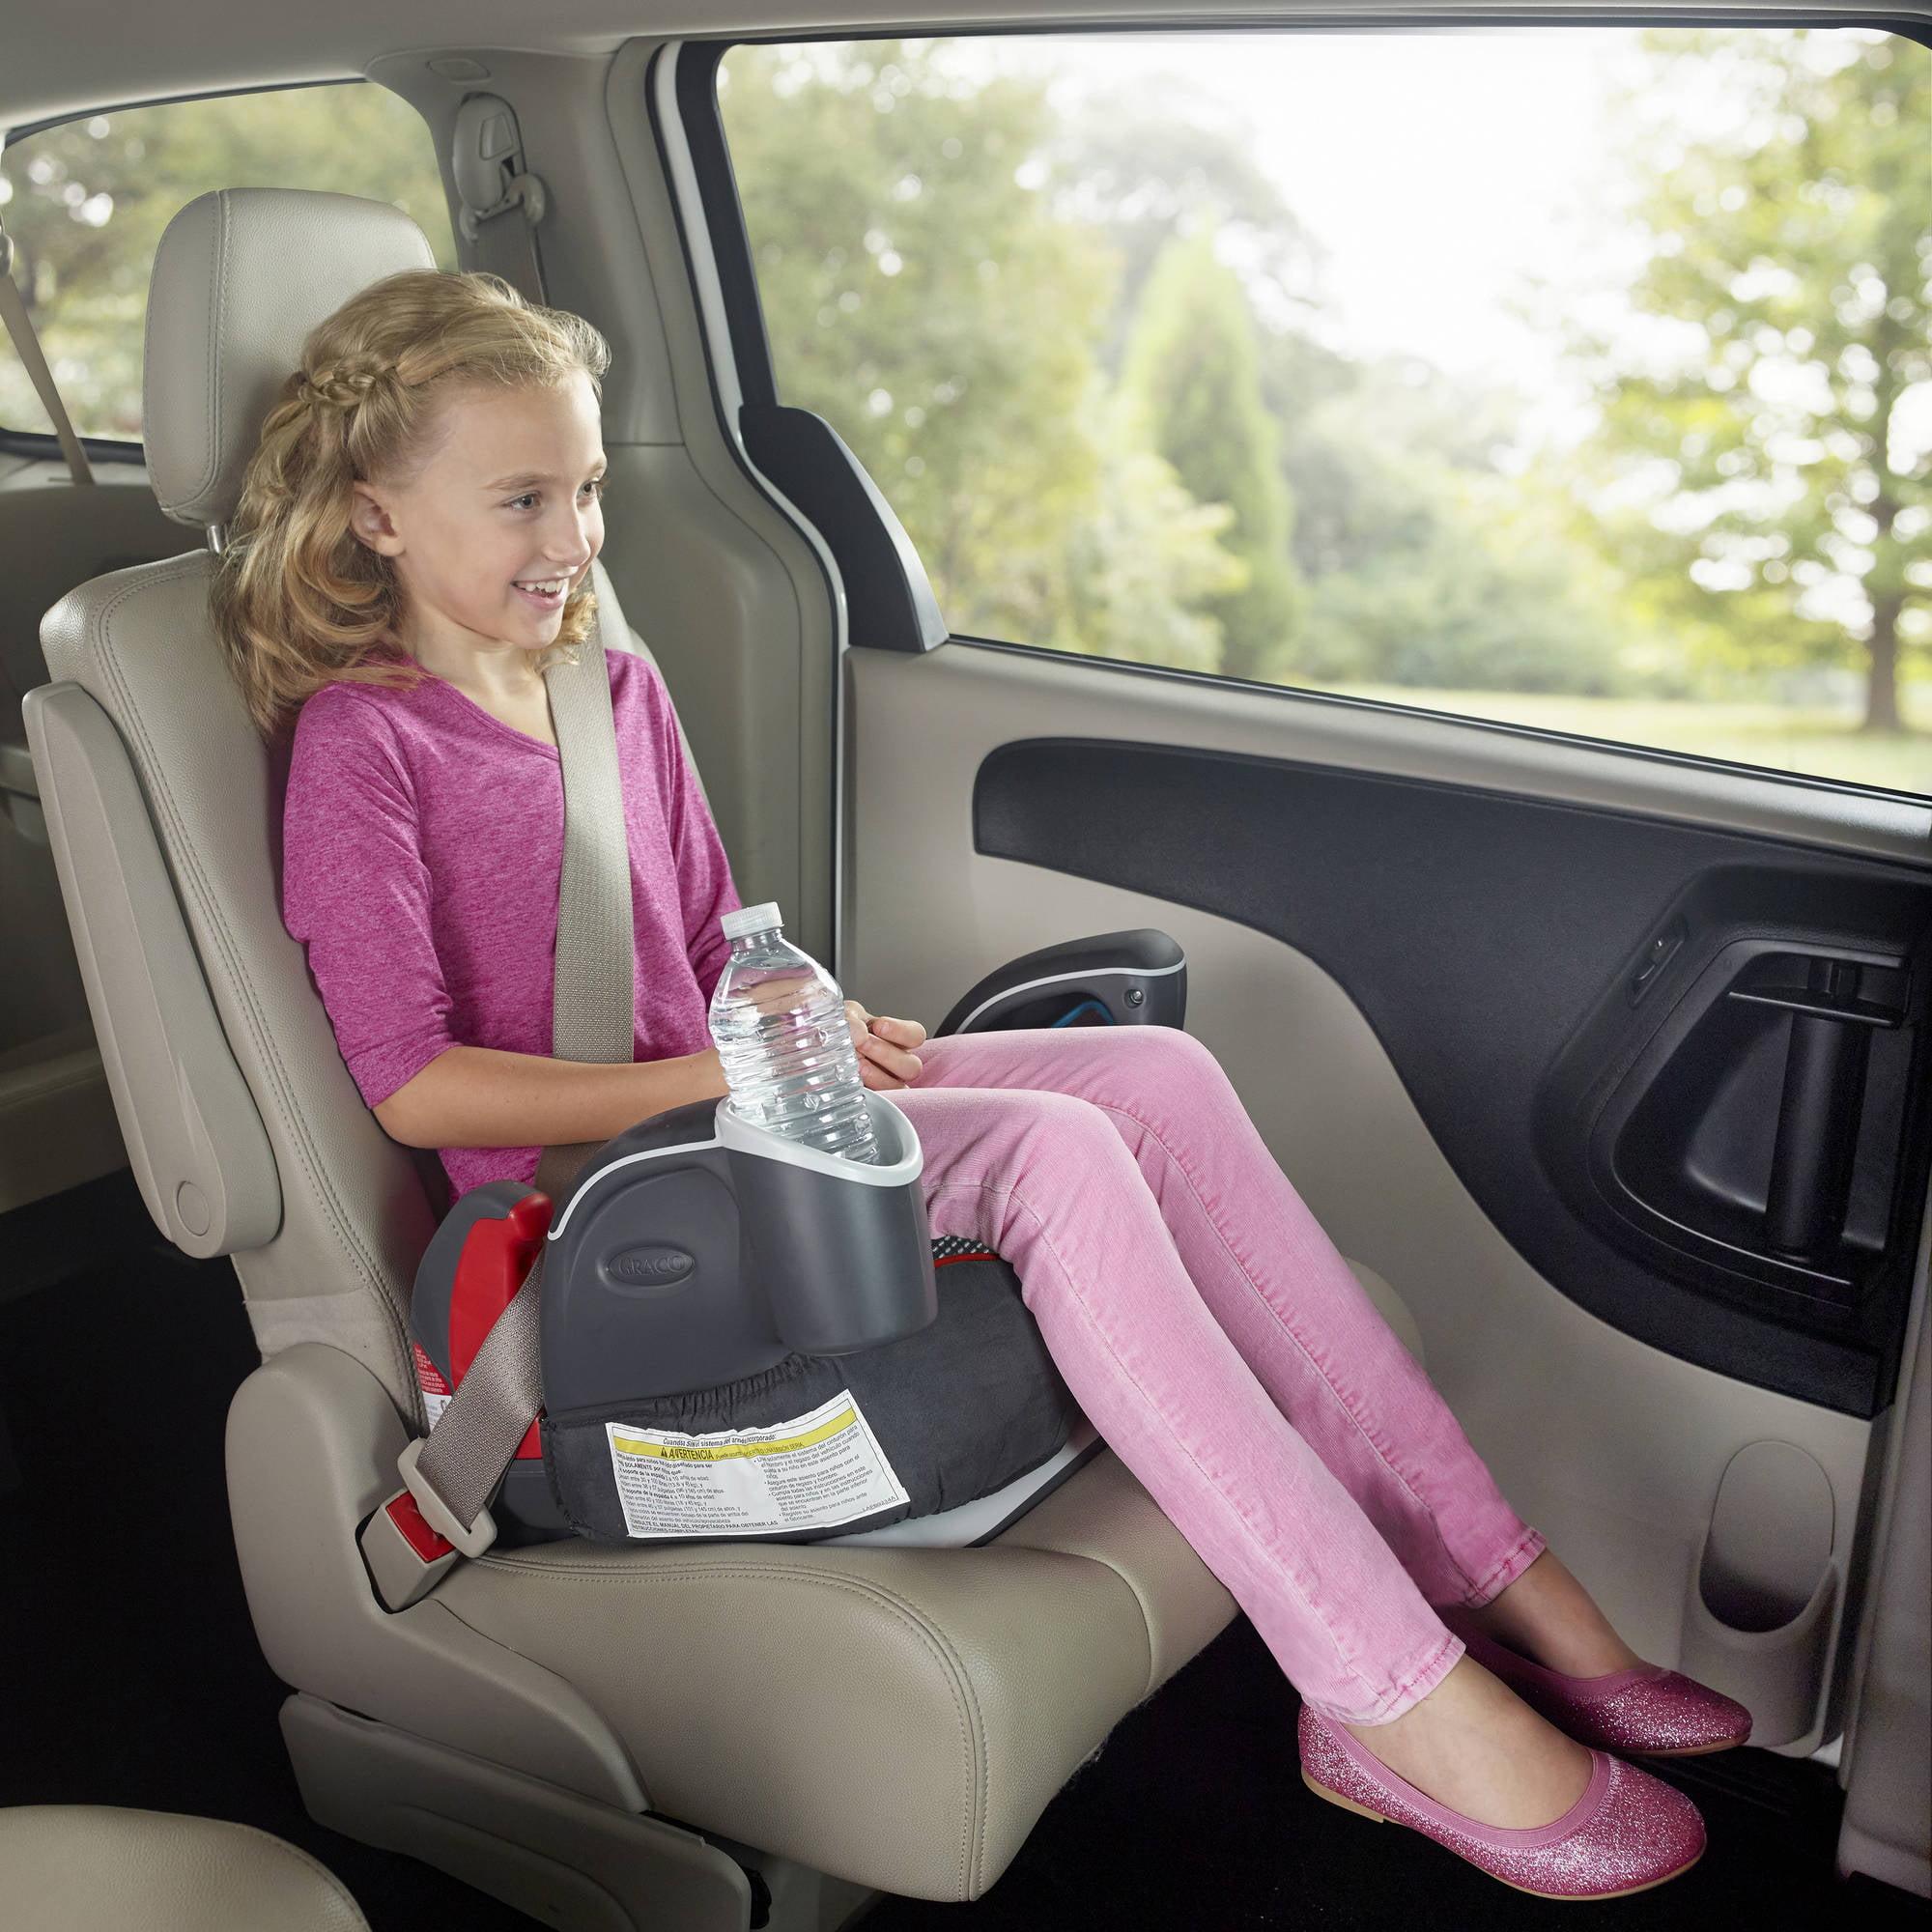 Graco nautilus 3 in 1 multi use car seat - Graco Nautilus 3 In 1 Multi Use Car Seat 29